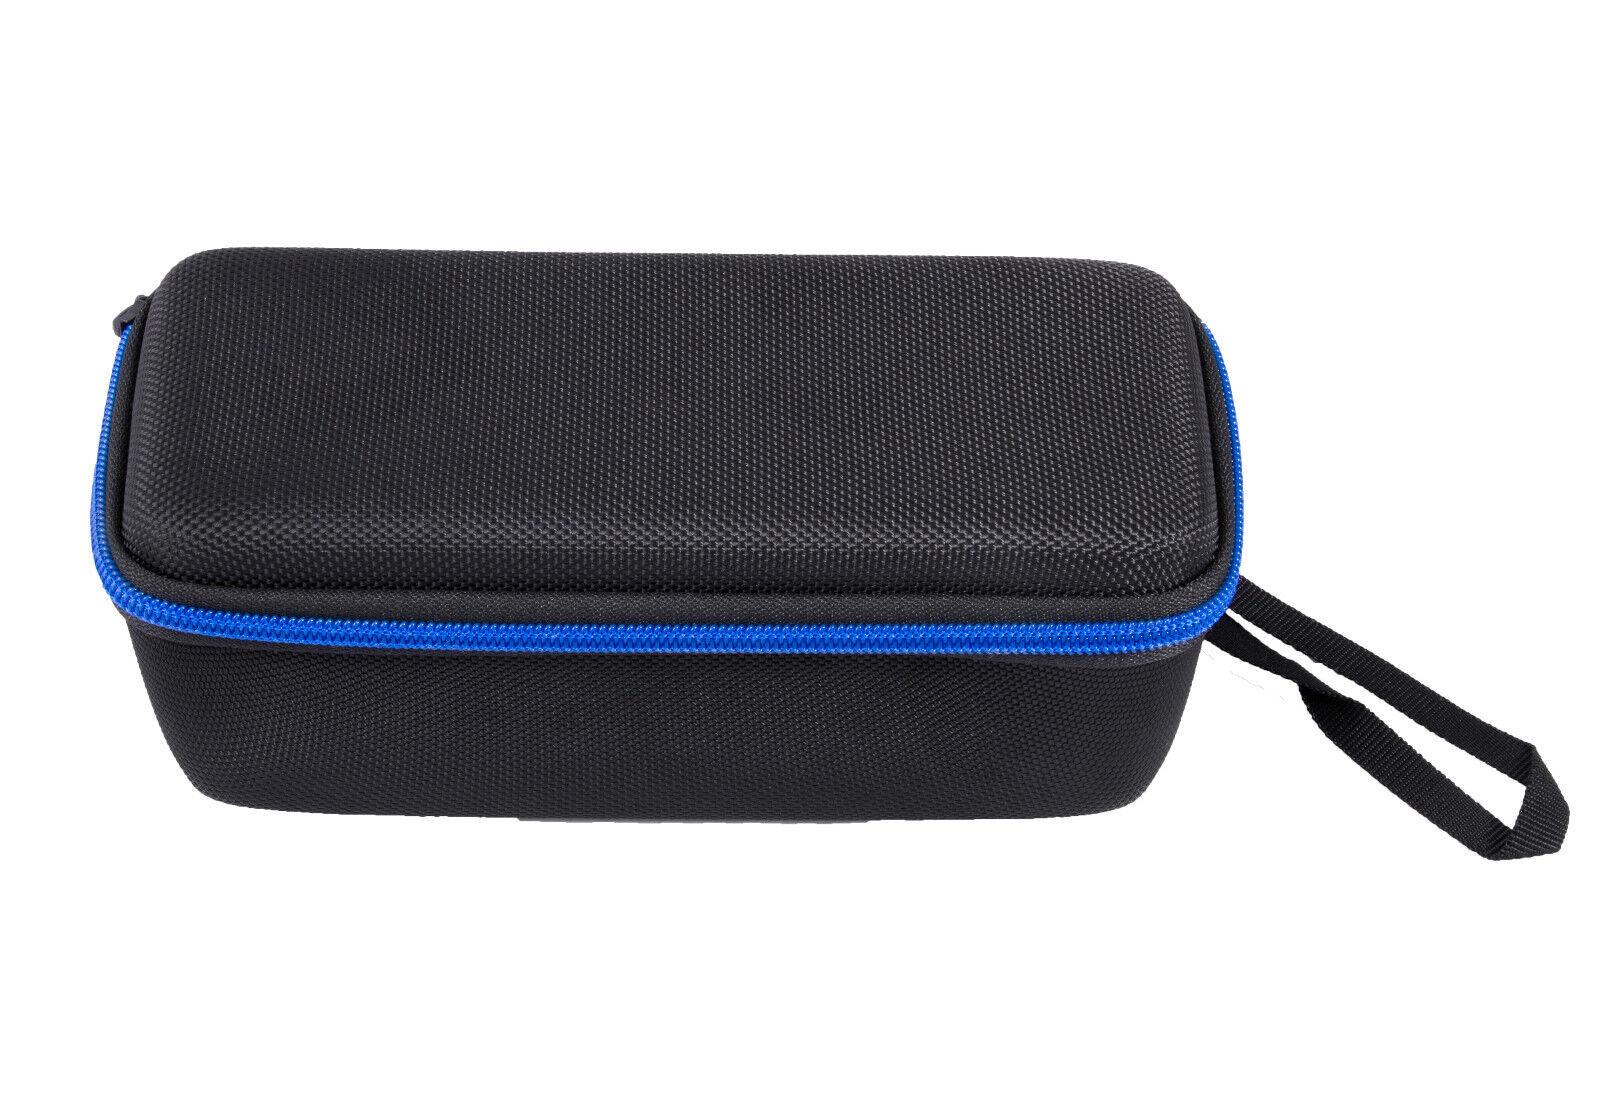 CASEMATIX Portable Bluetooth Speaker Case For NOVASAT Blueto